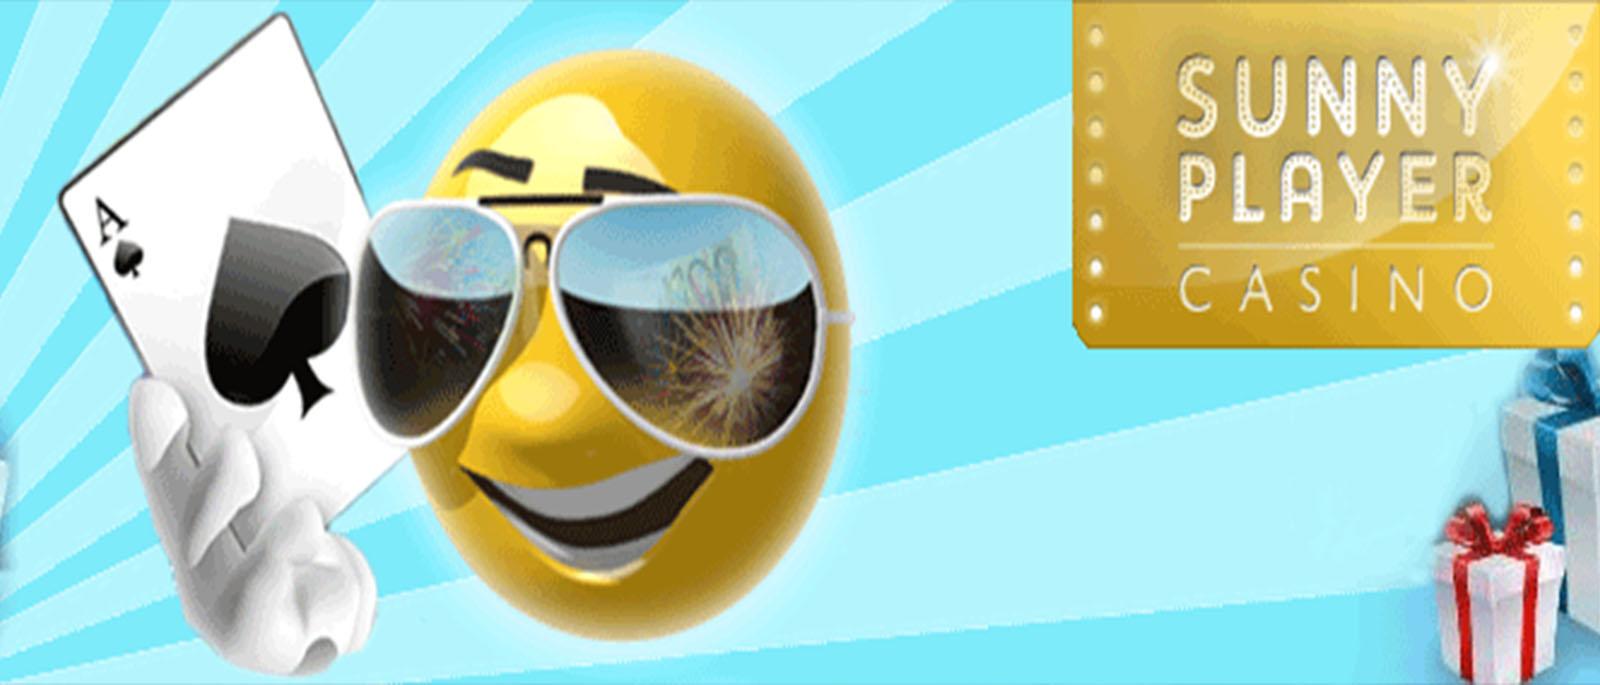 Sunny Player Casino Test